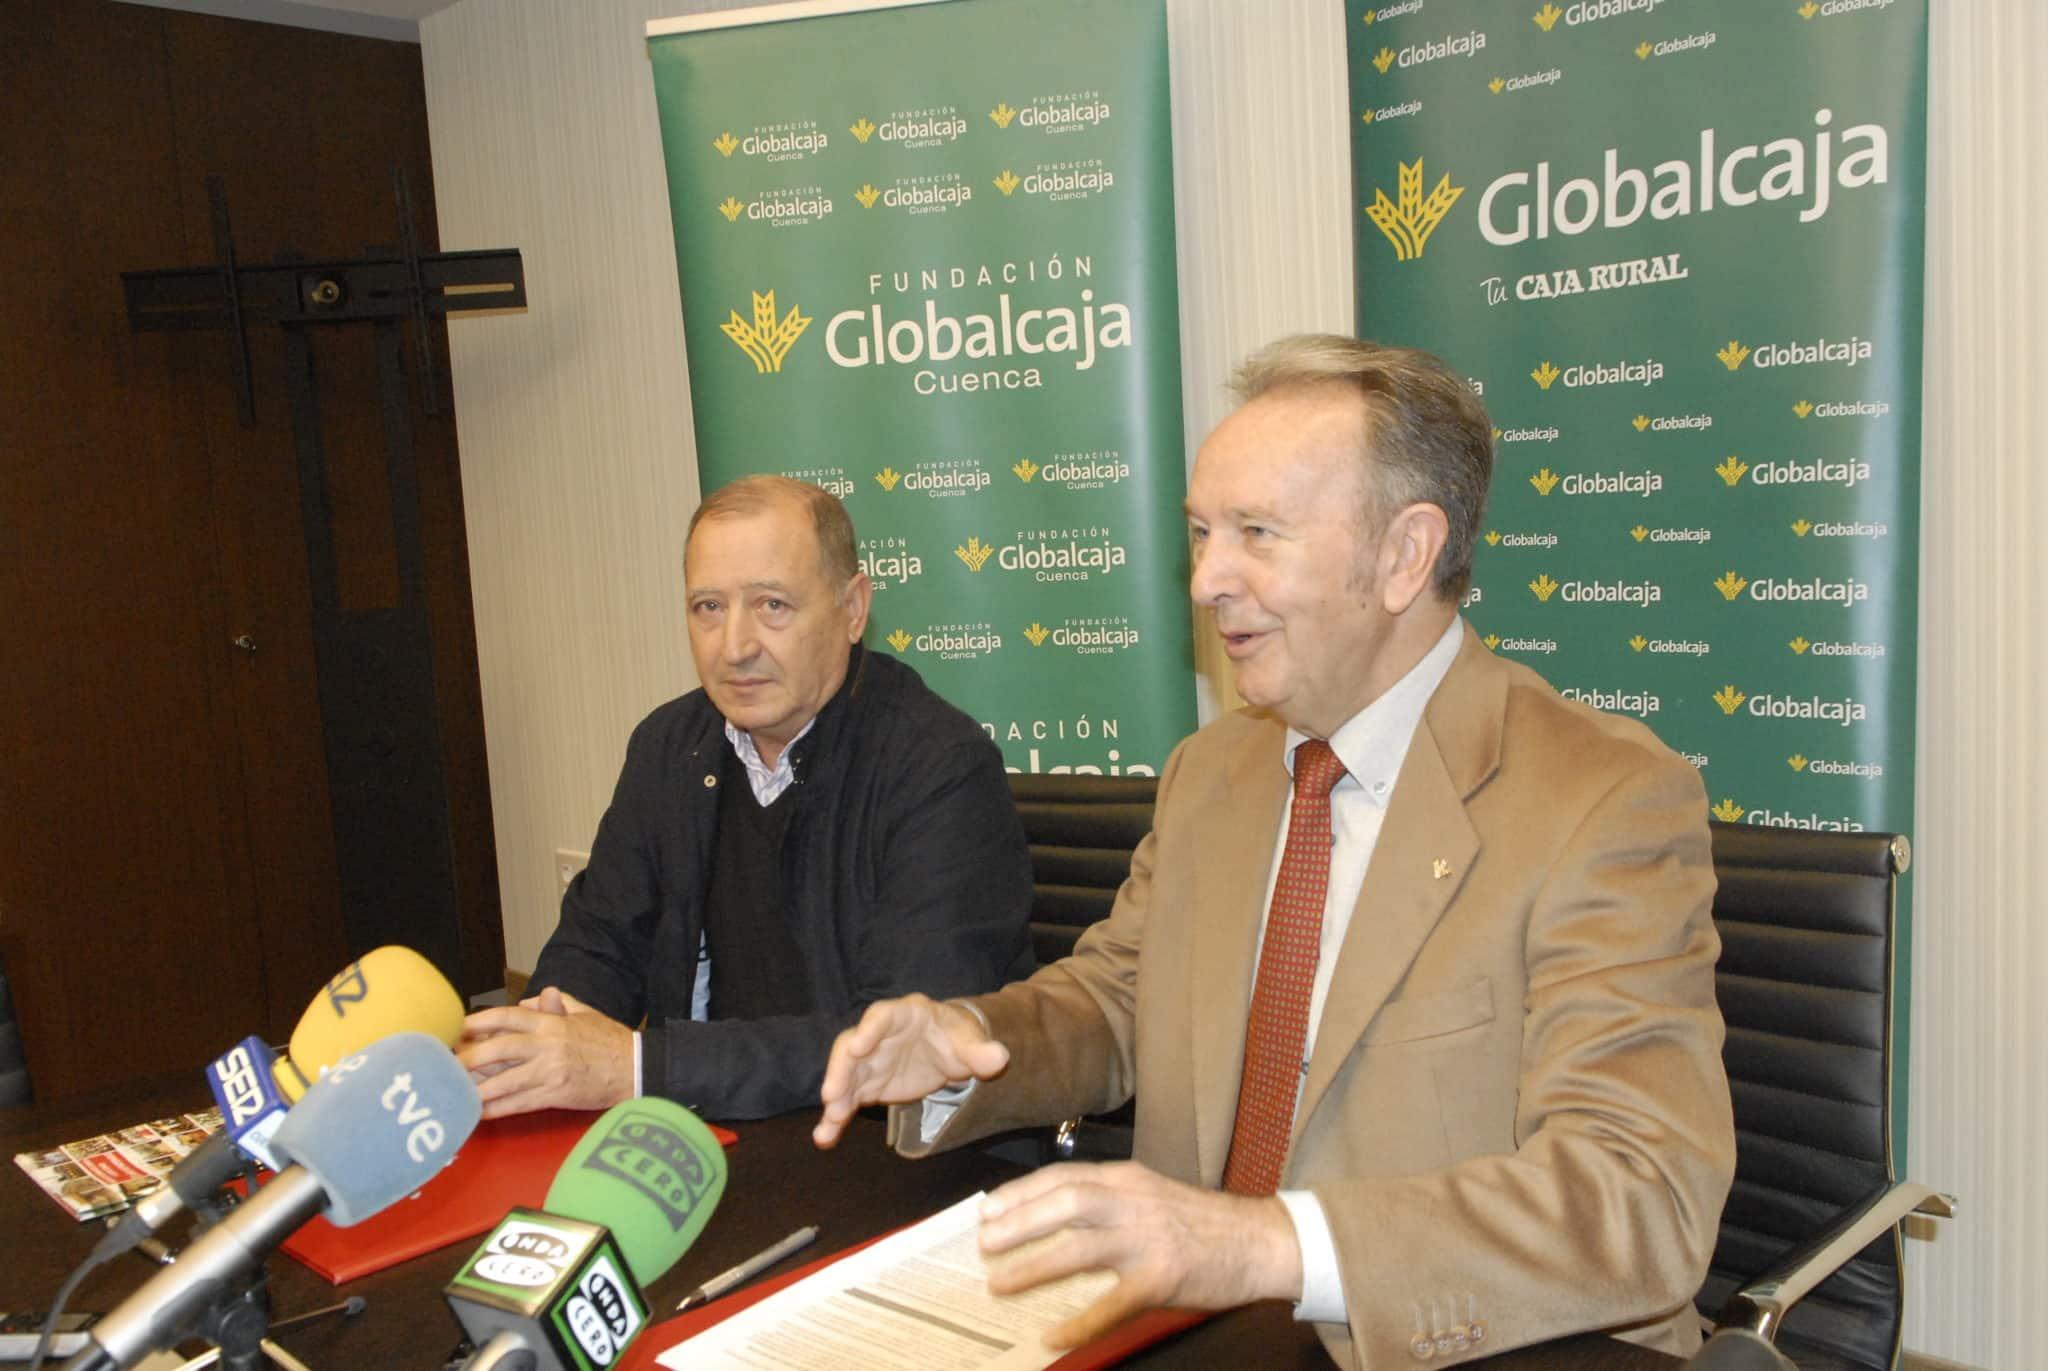 globalcaja caritas cu oct 2015 010